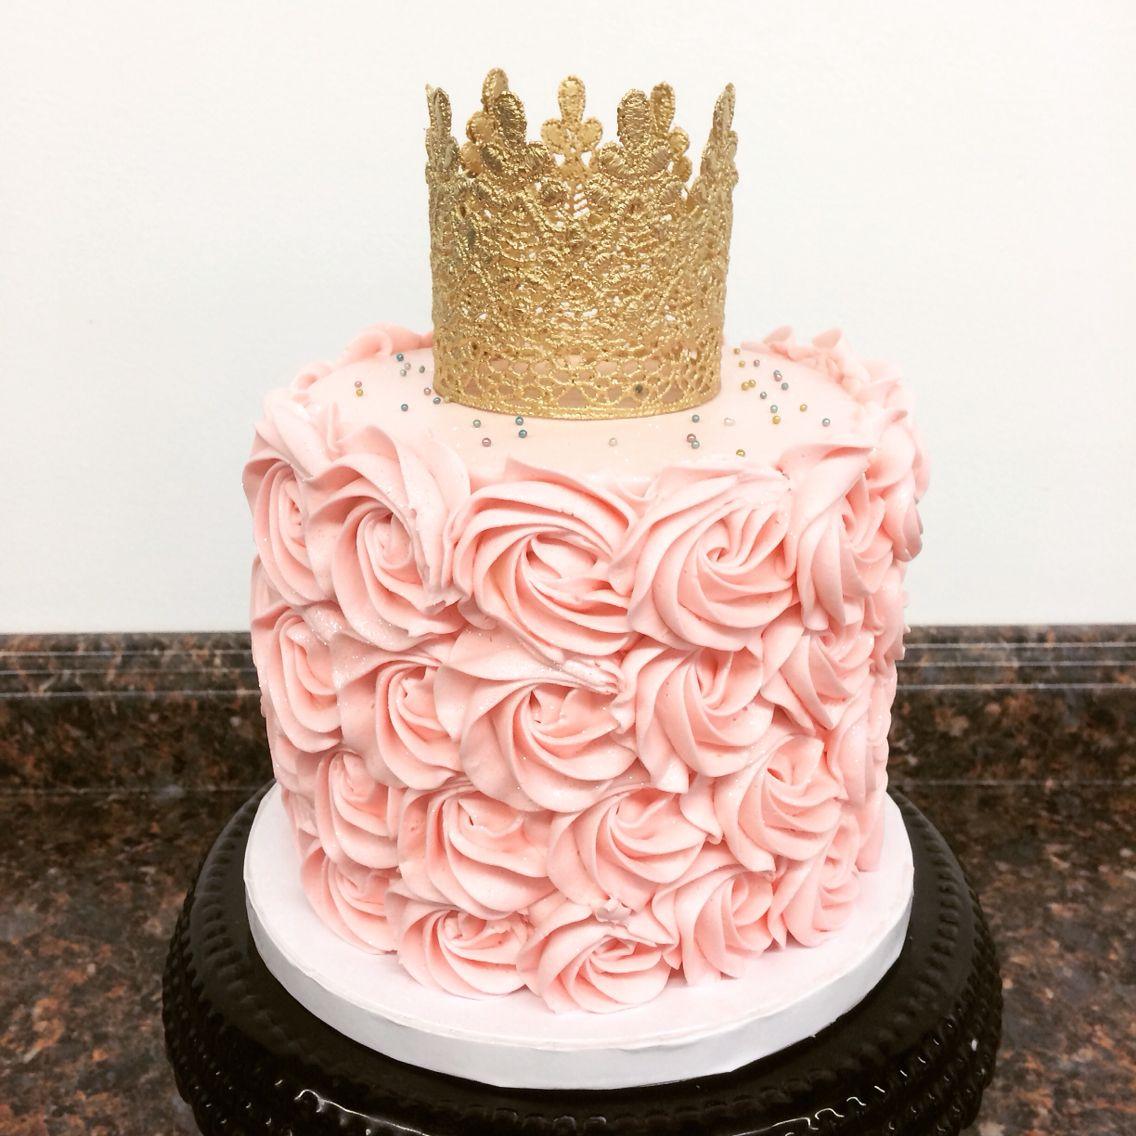 Pink And Gold Princess First Birthday Smash Cake Cami S Cake Co In Eudora Ks